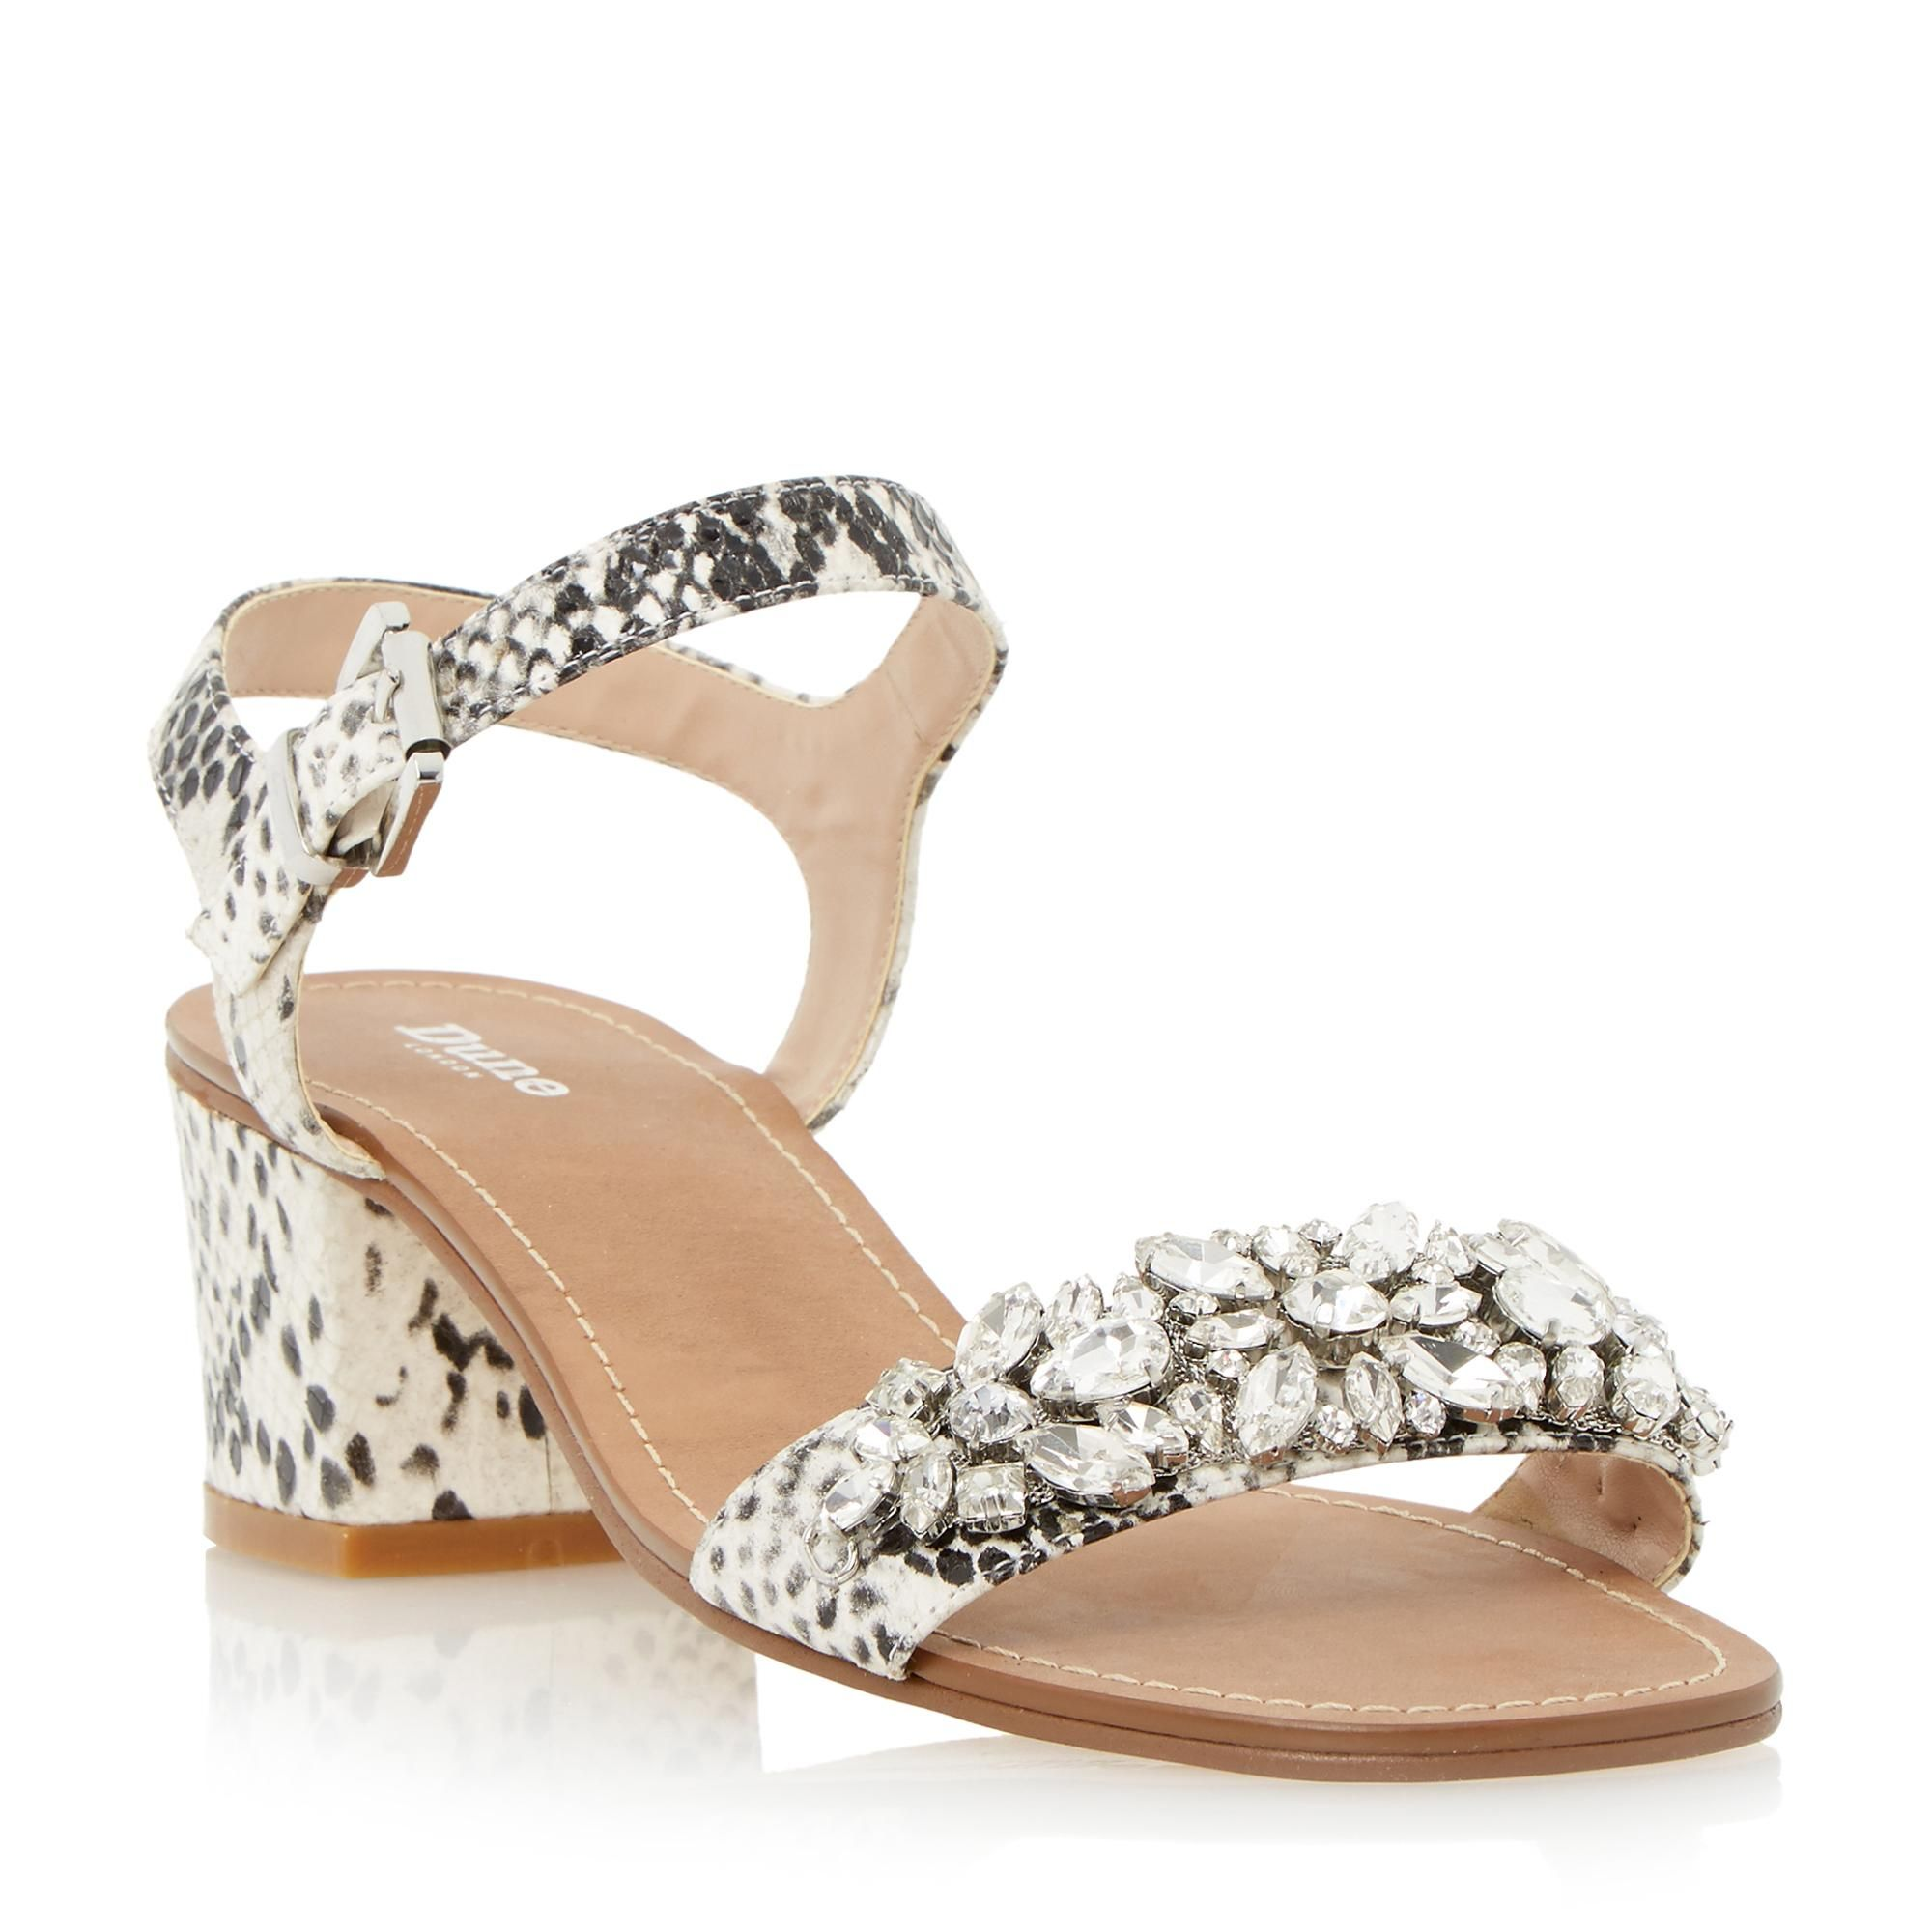 Black sandals dune - Dune Ladies Mahala Embellished Two Part Mid Heel Sandal Black White Dune Shoes